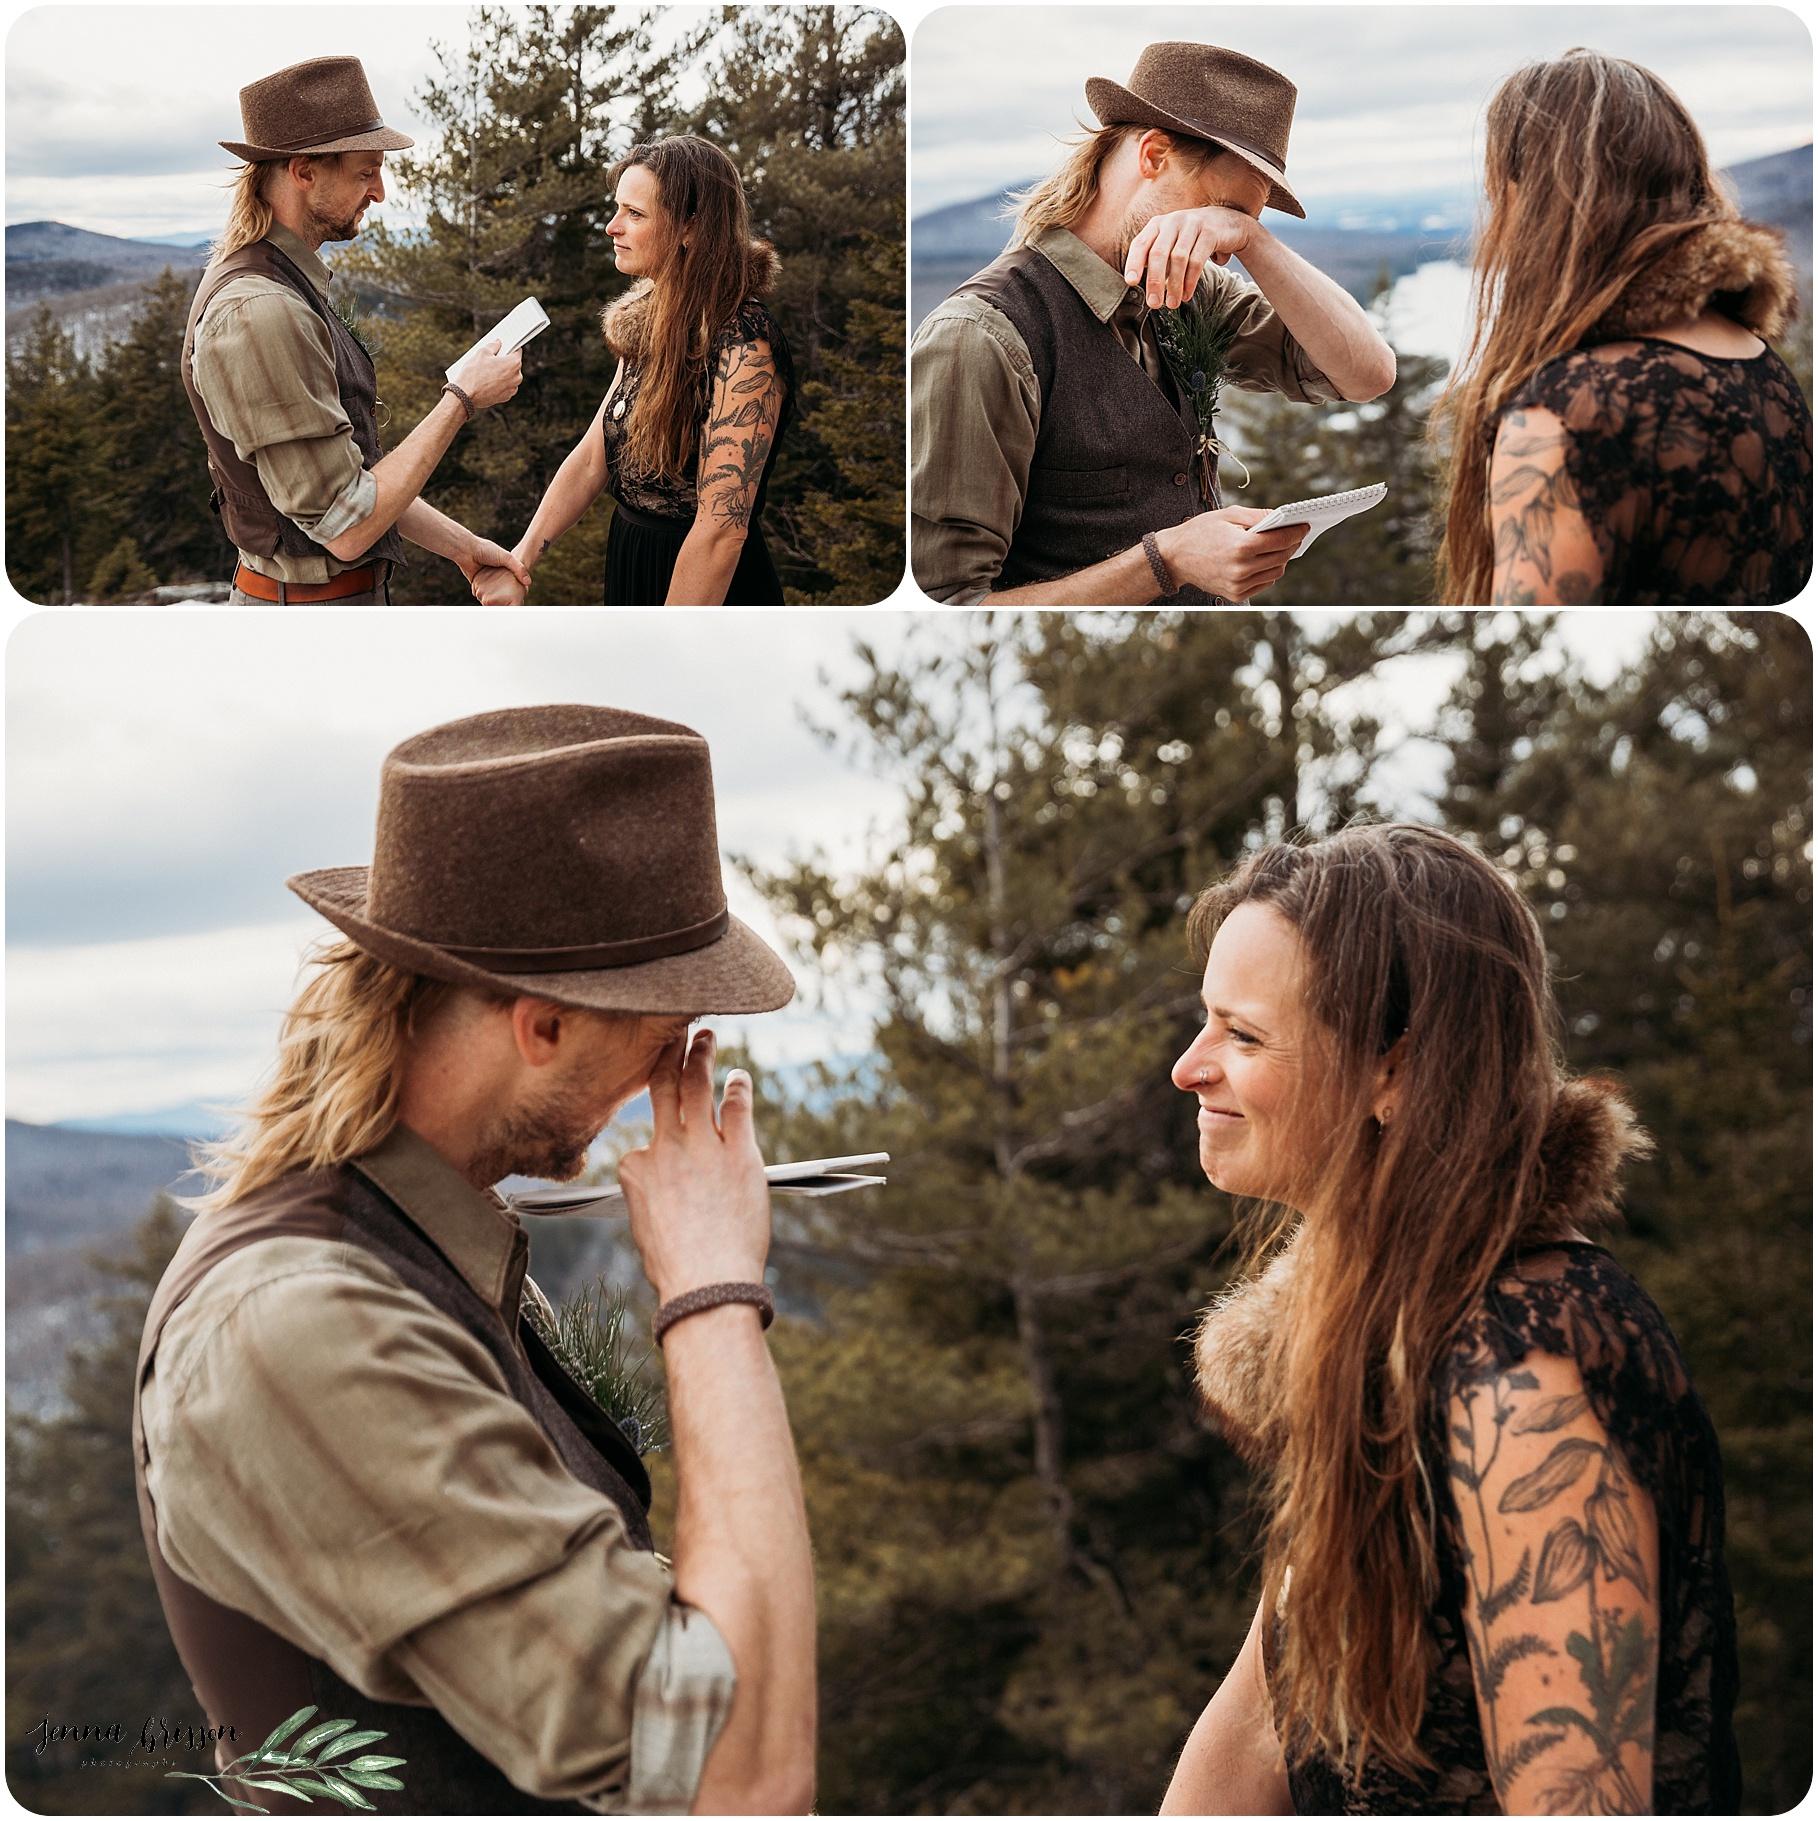 Vermont State Park Wedding - Groton Vermont